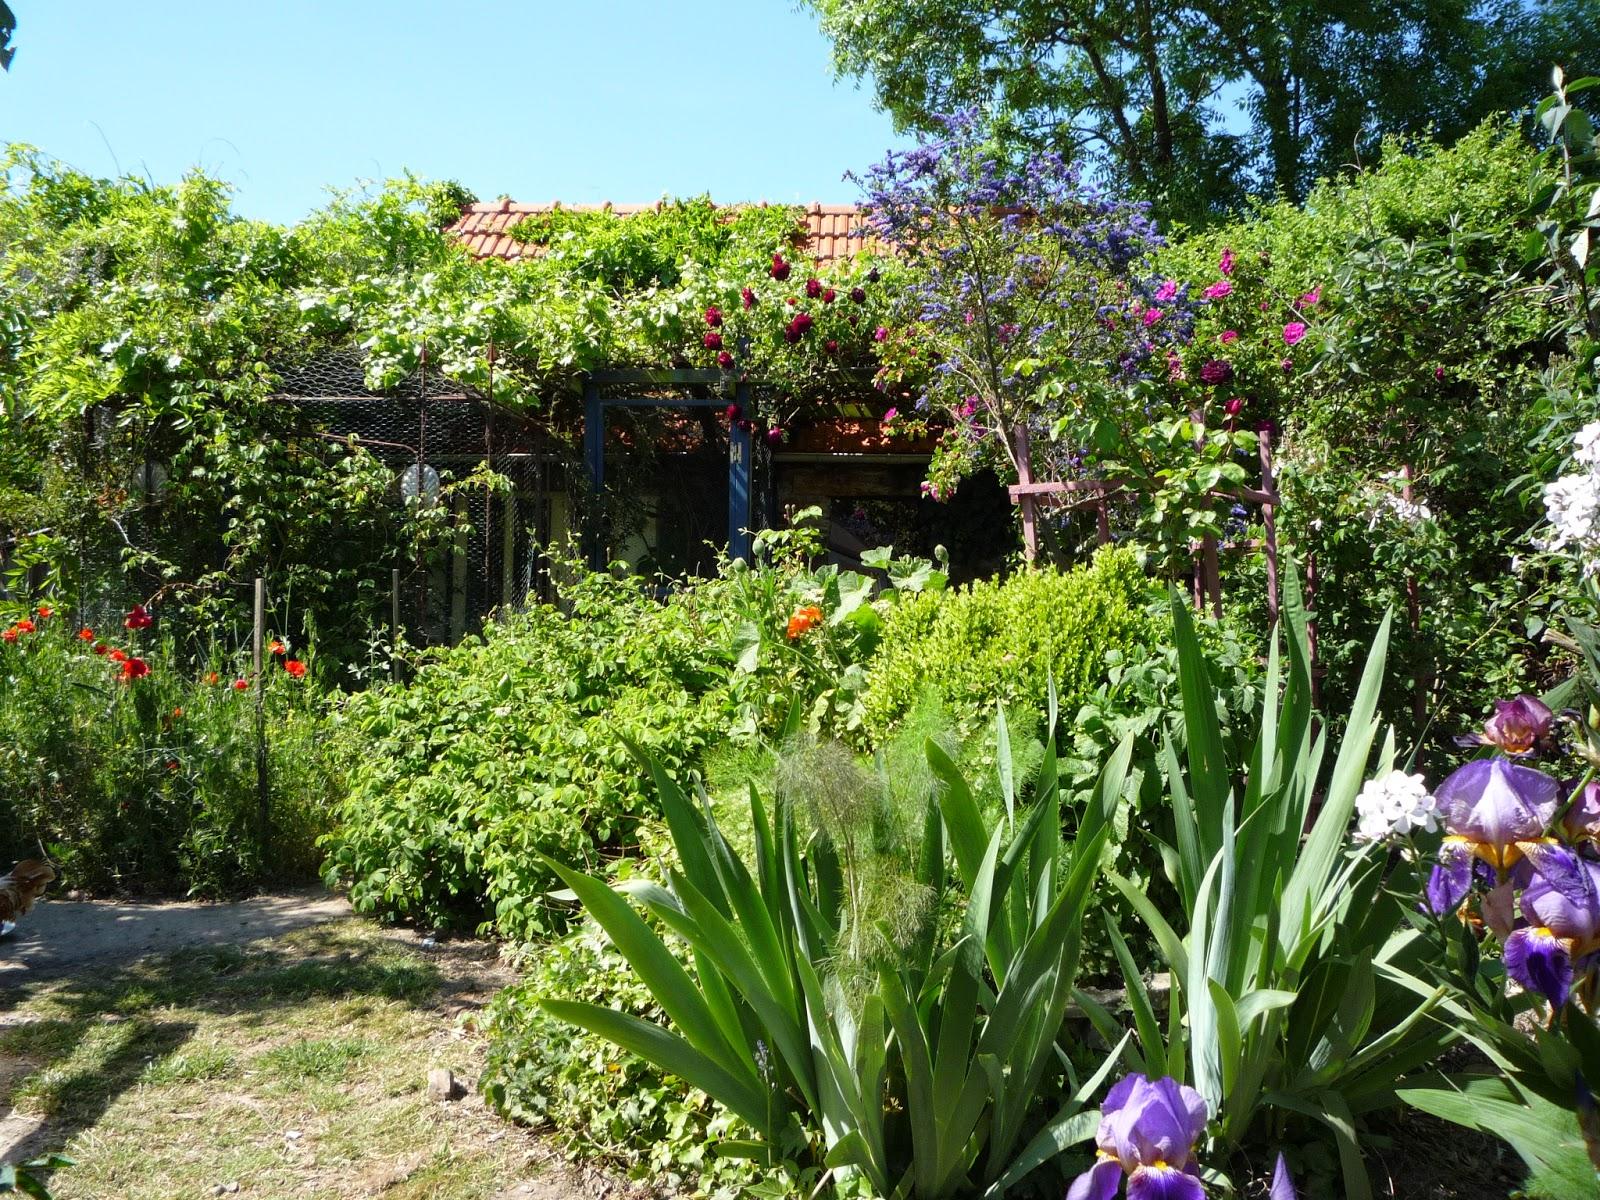 Organic forest garden, Normandy France